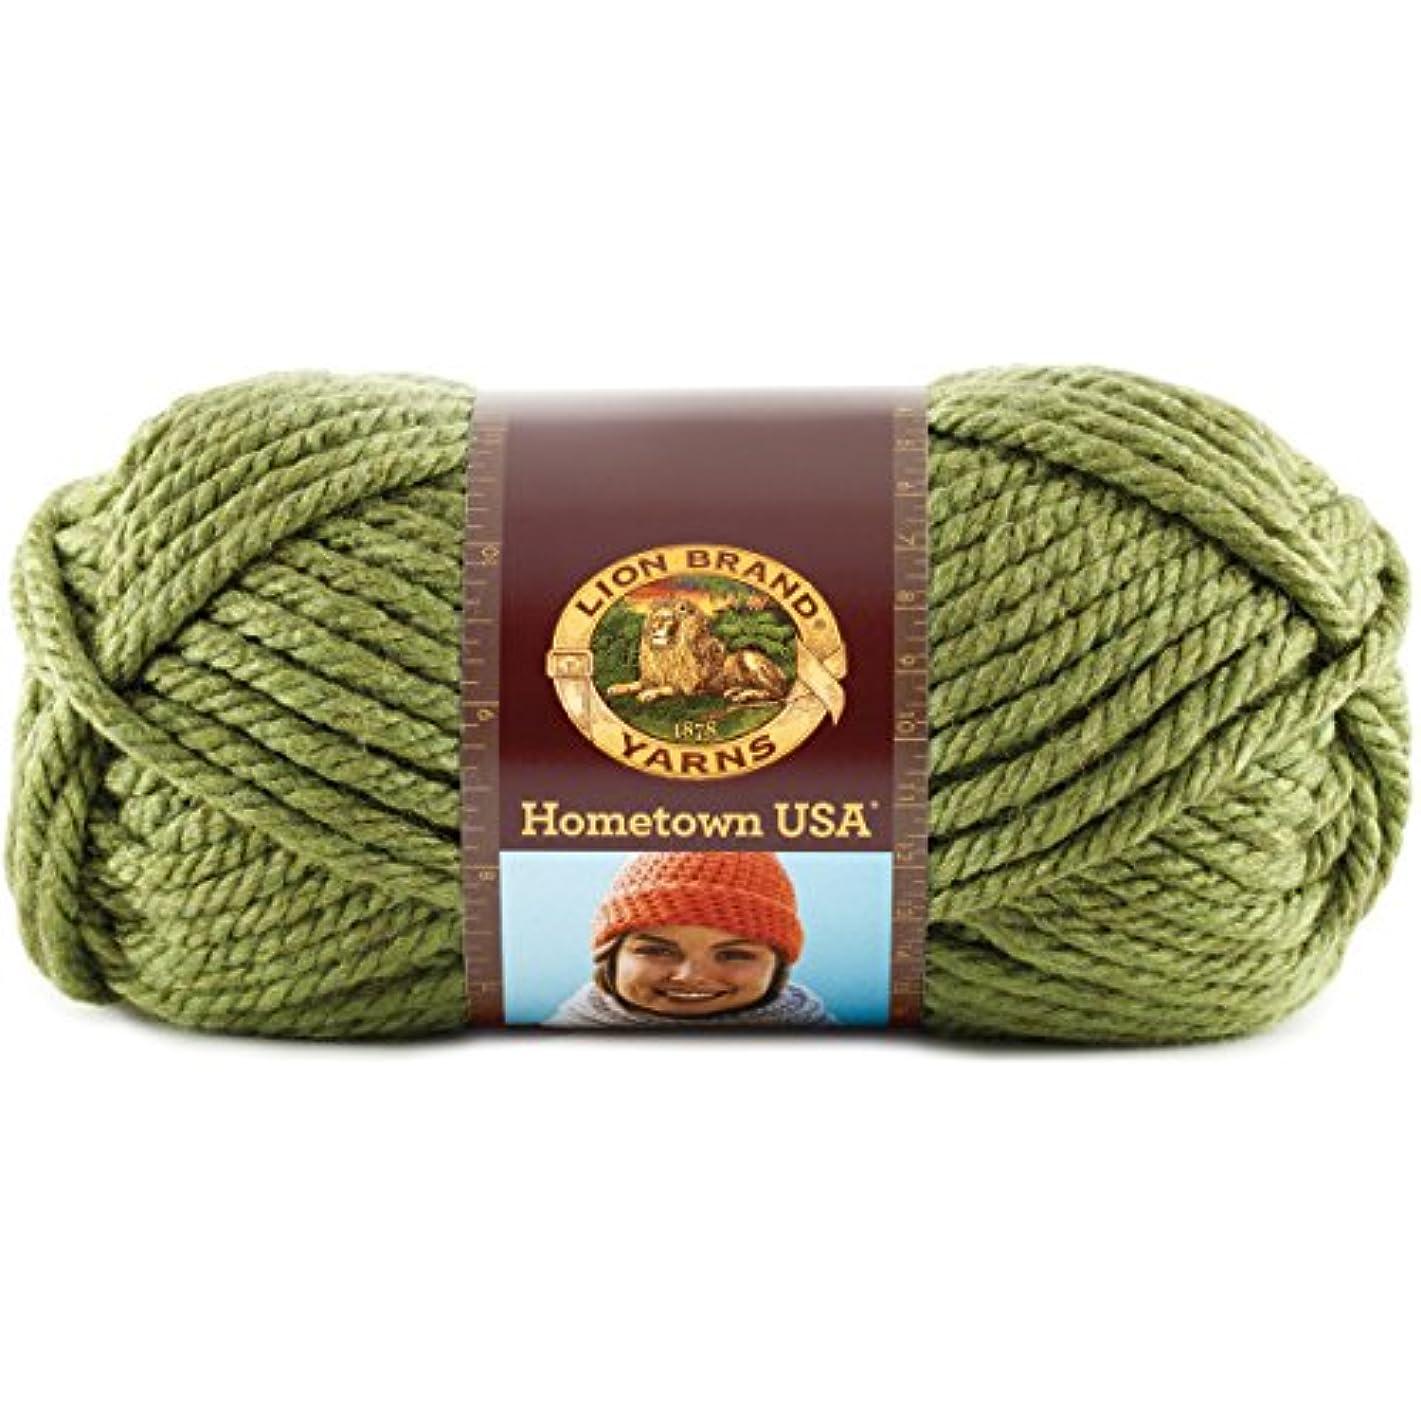 Lion Brand Yarn LBY-434 Hometown USA Yarn (172) Oklahoma City Green, Sonoma